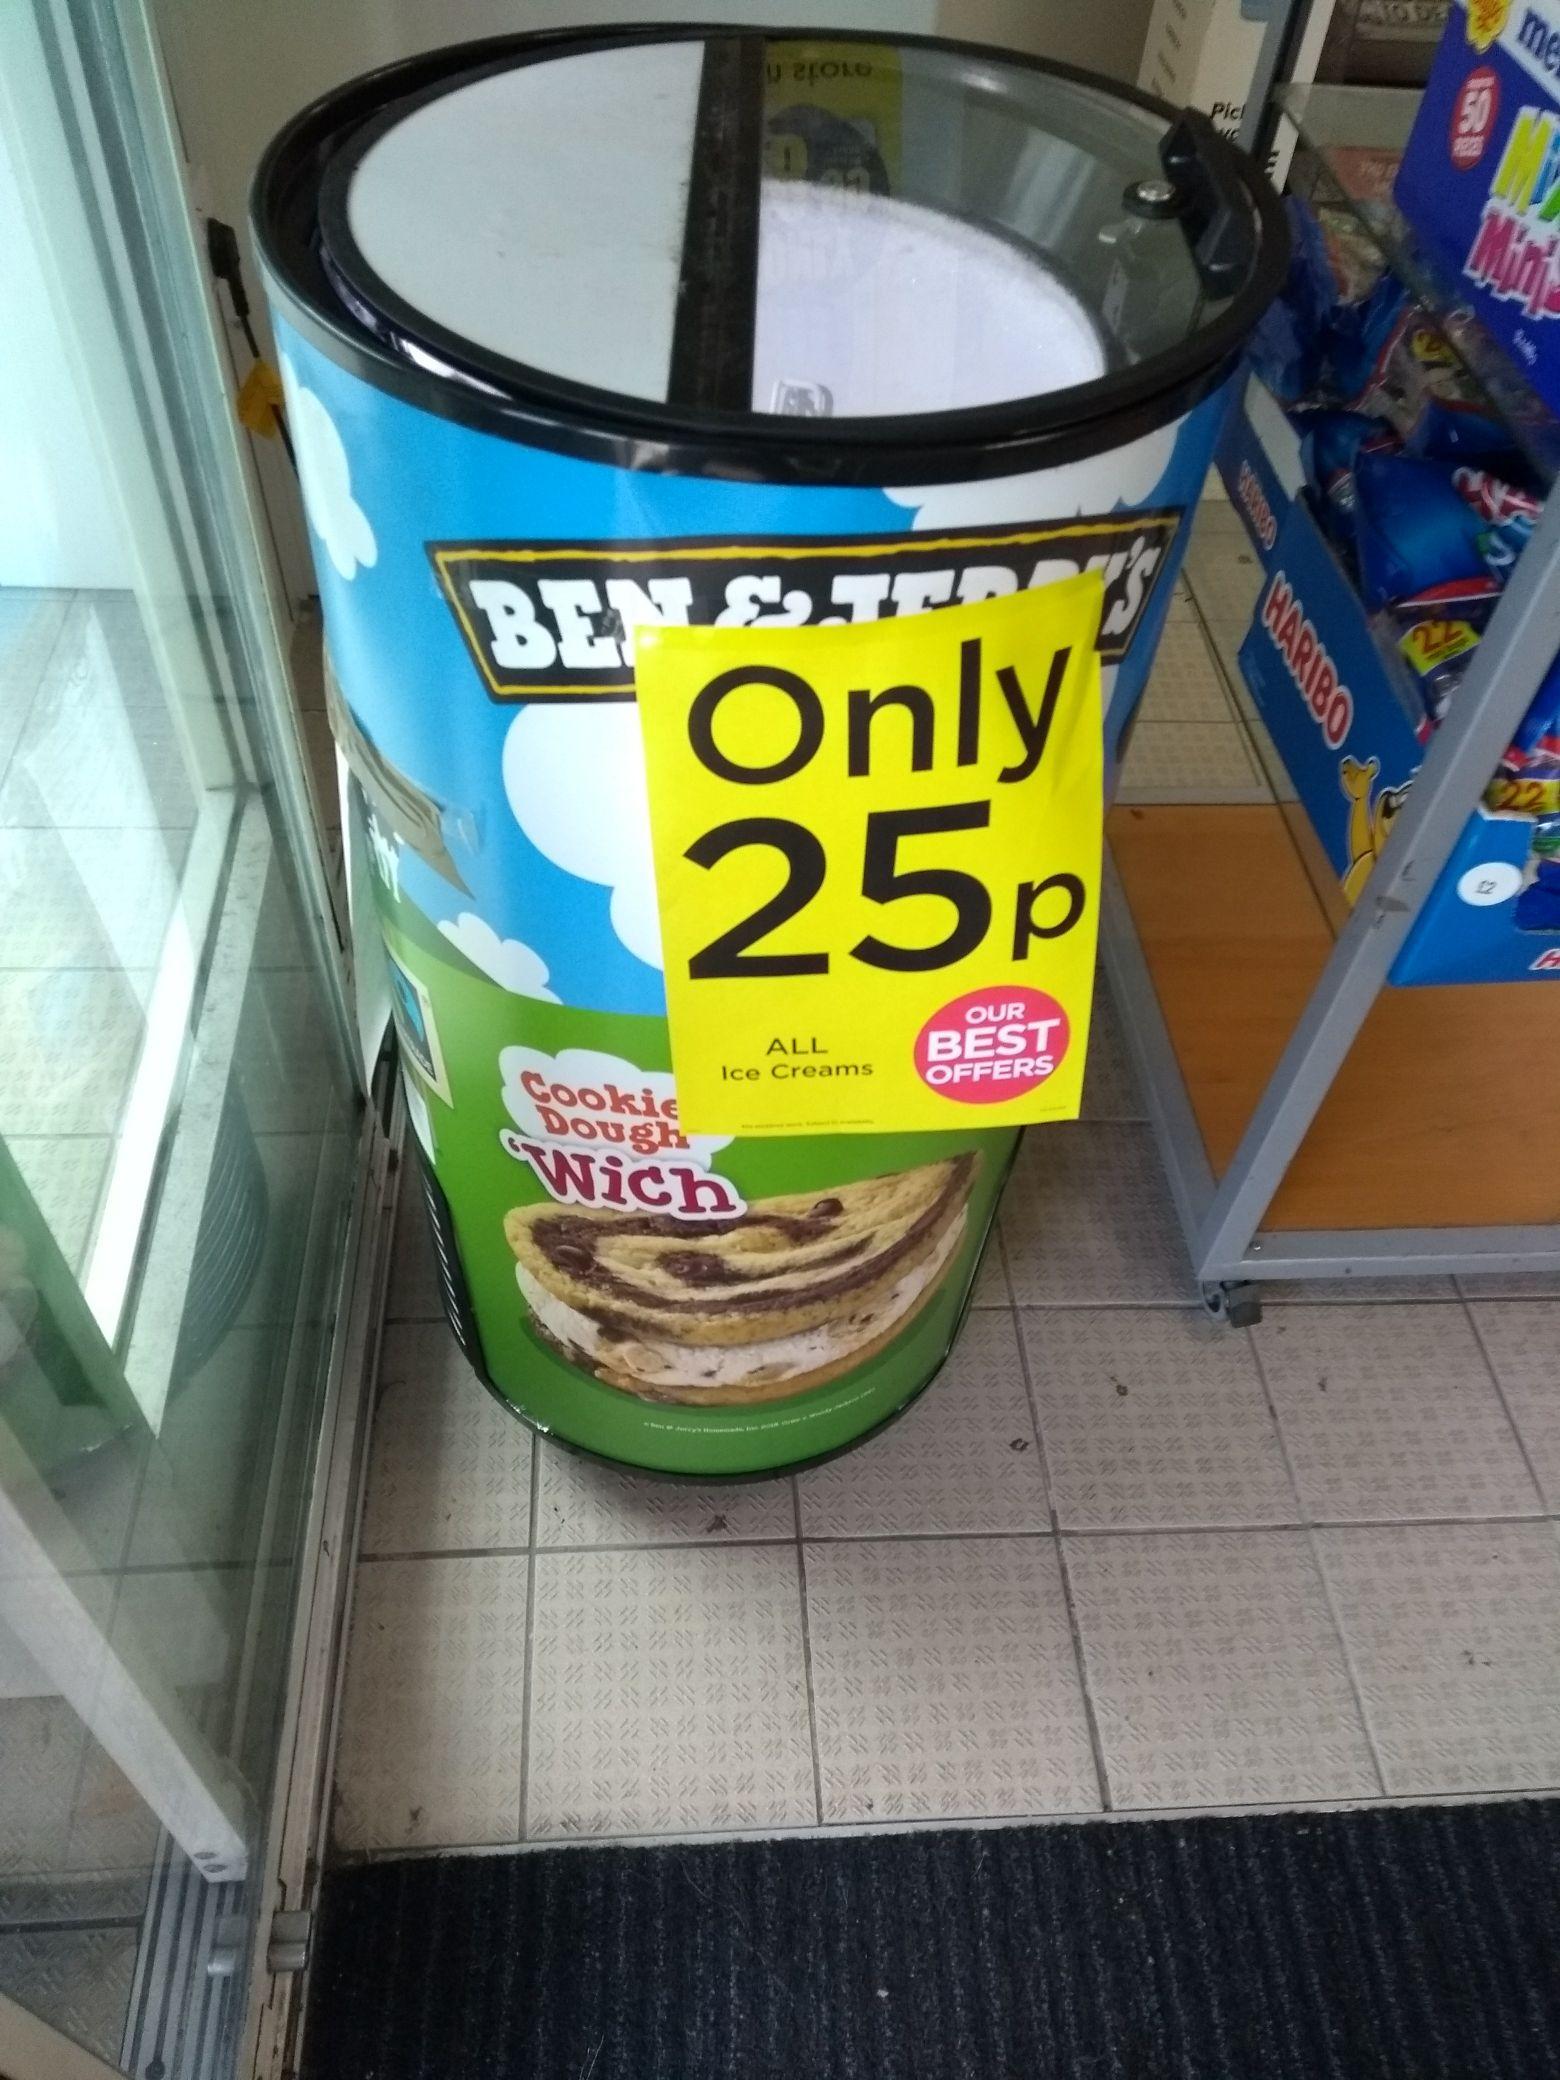 WHSmith Altrincham all ice creams 25p